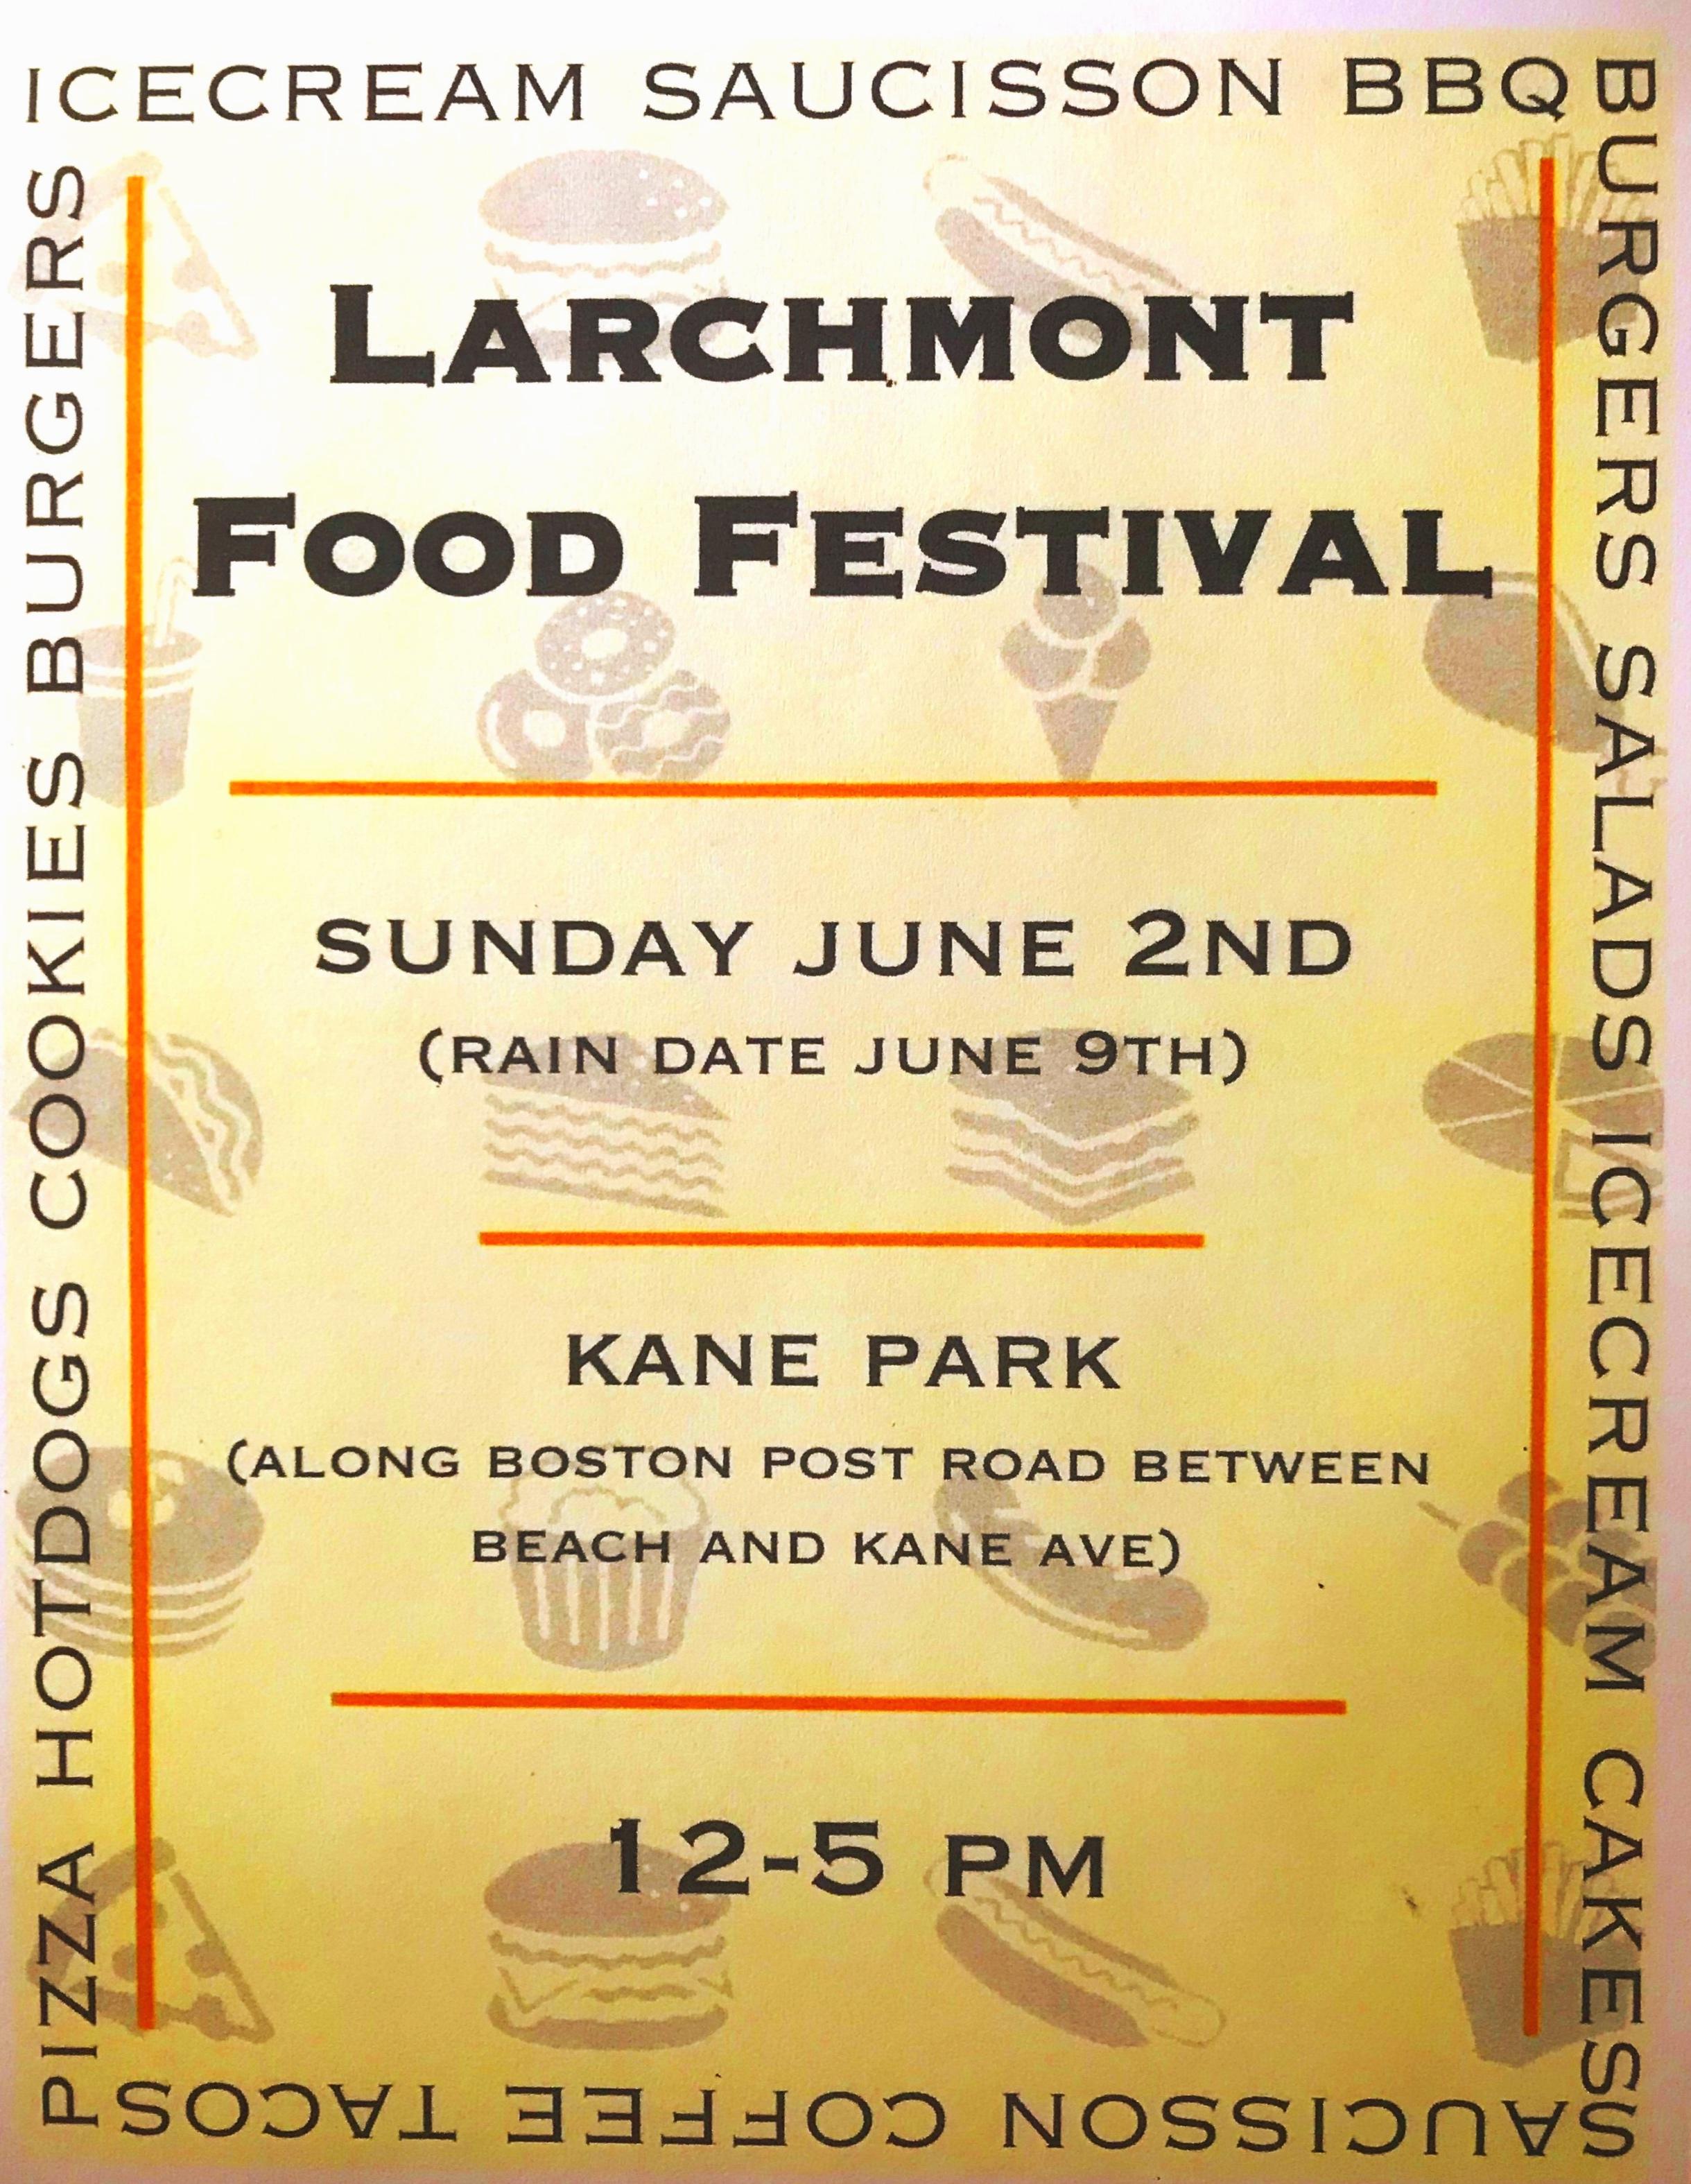 Larchmont Food Festival Sunday June 2nd 2019